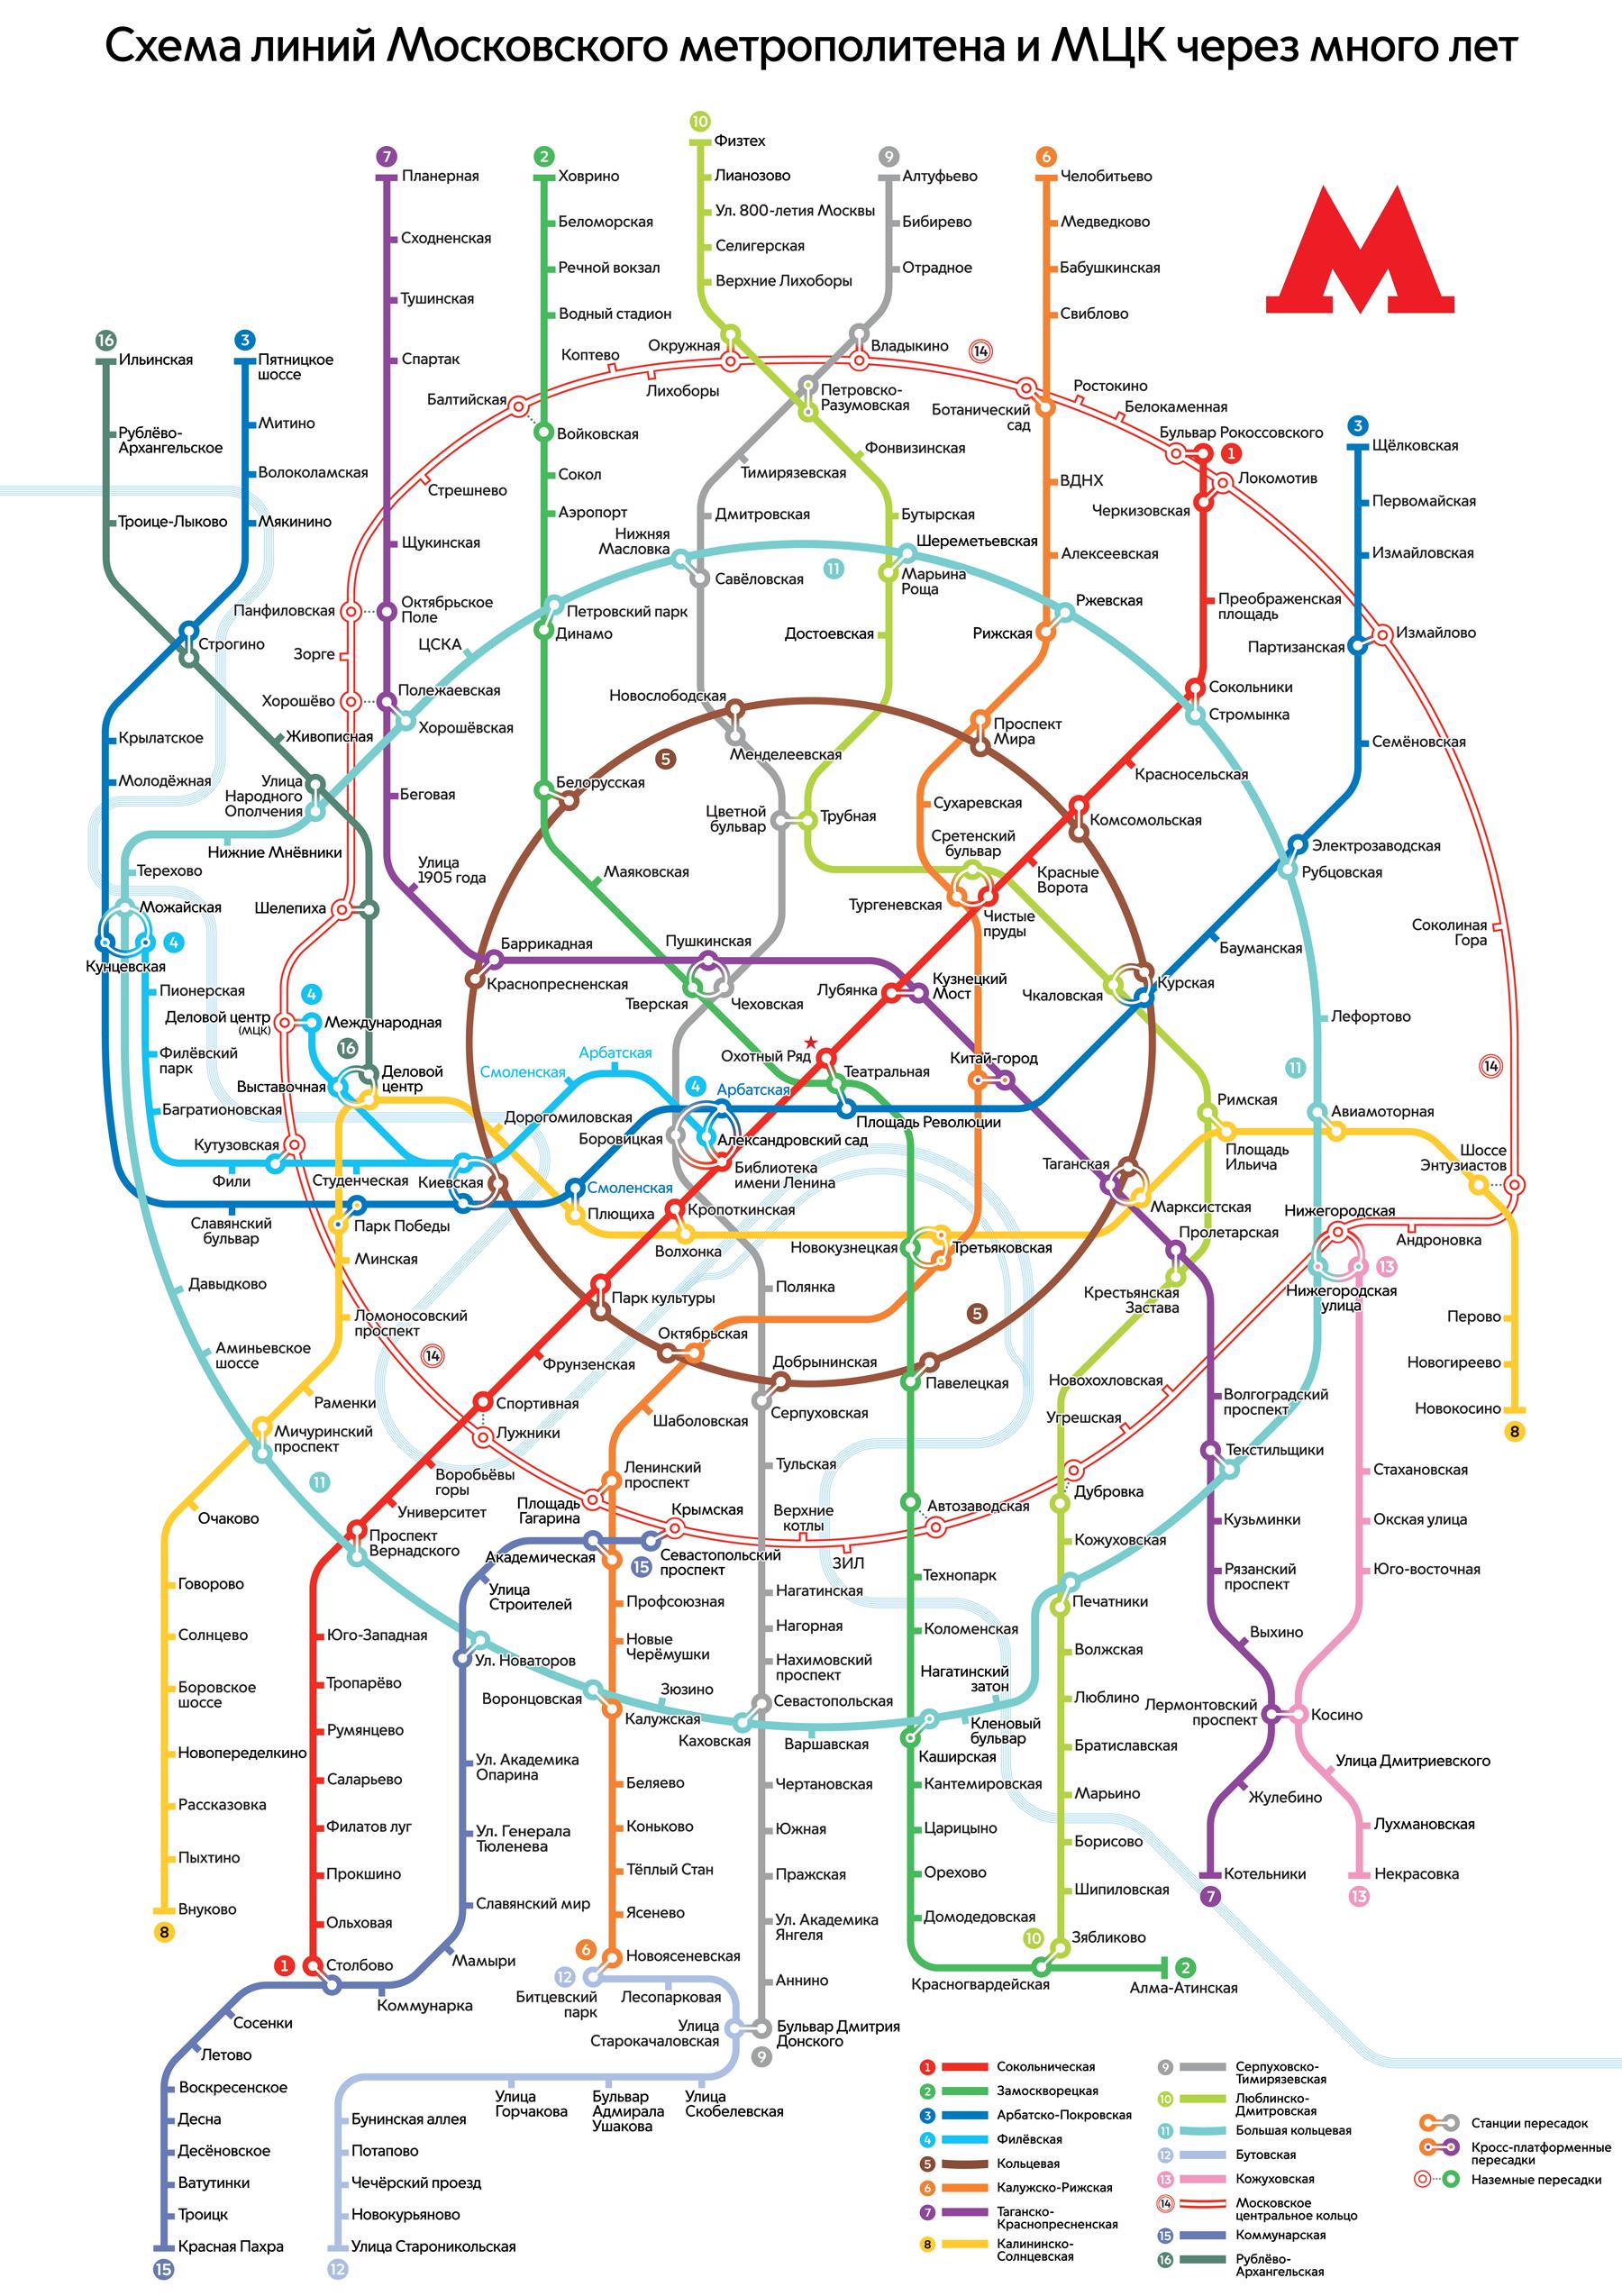 Схема перспективного развития метрополитена фото 899